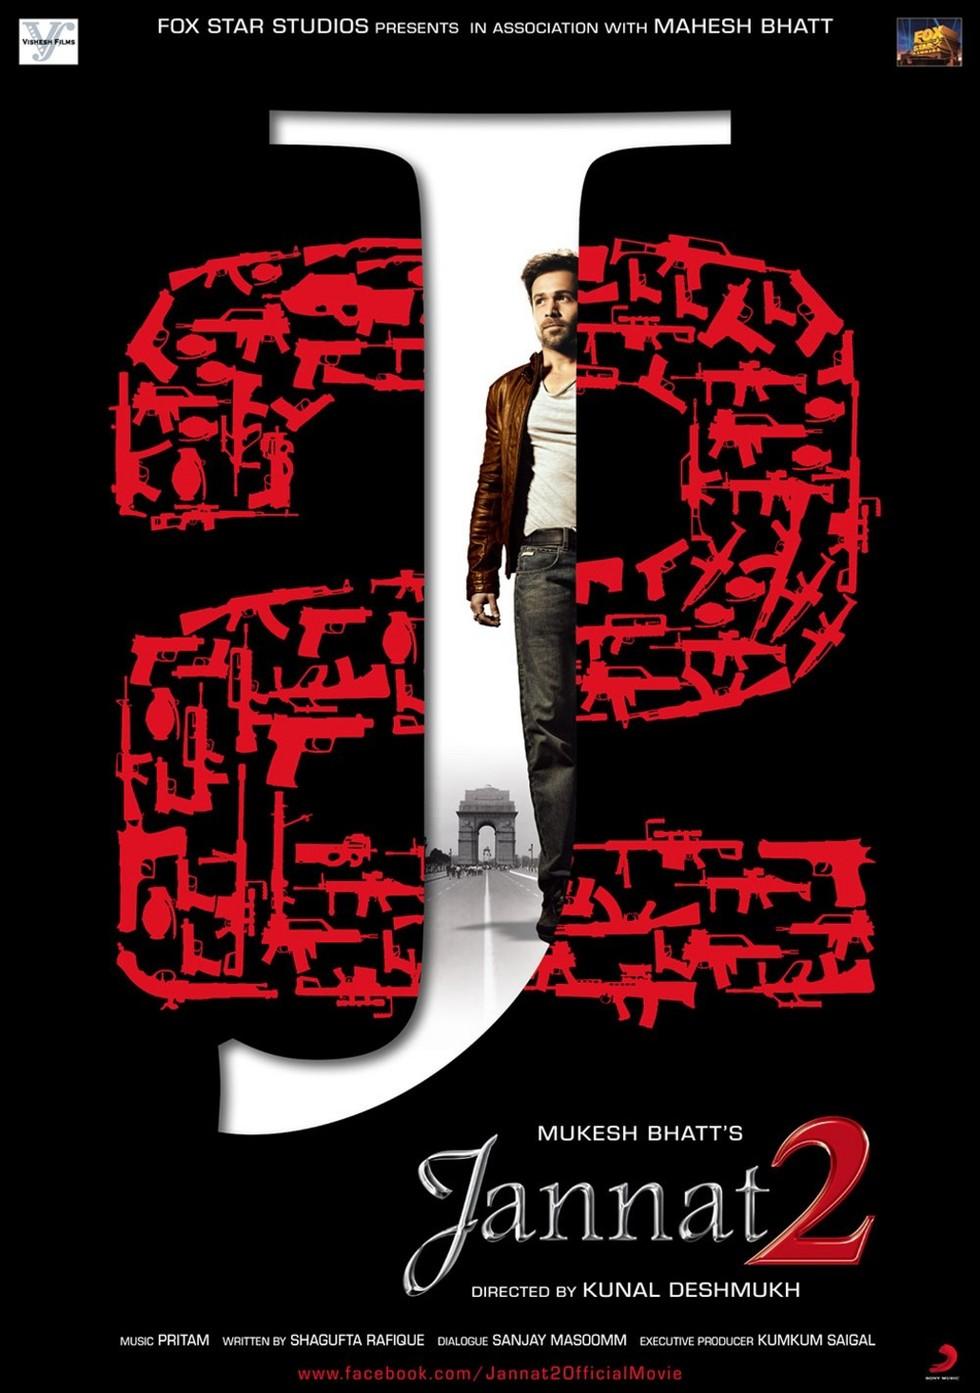 Jannat 2 - Movie Poster #2 (Large)